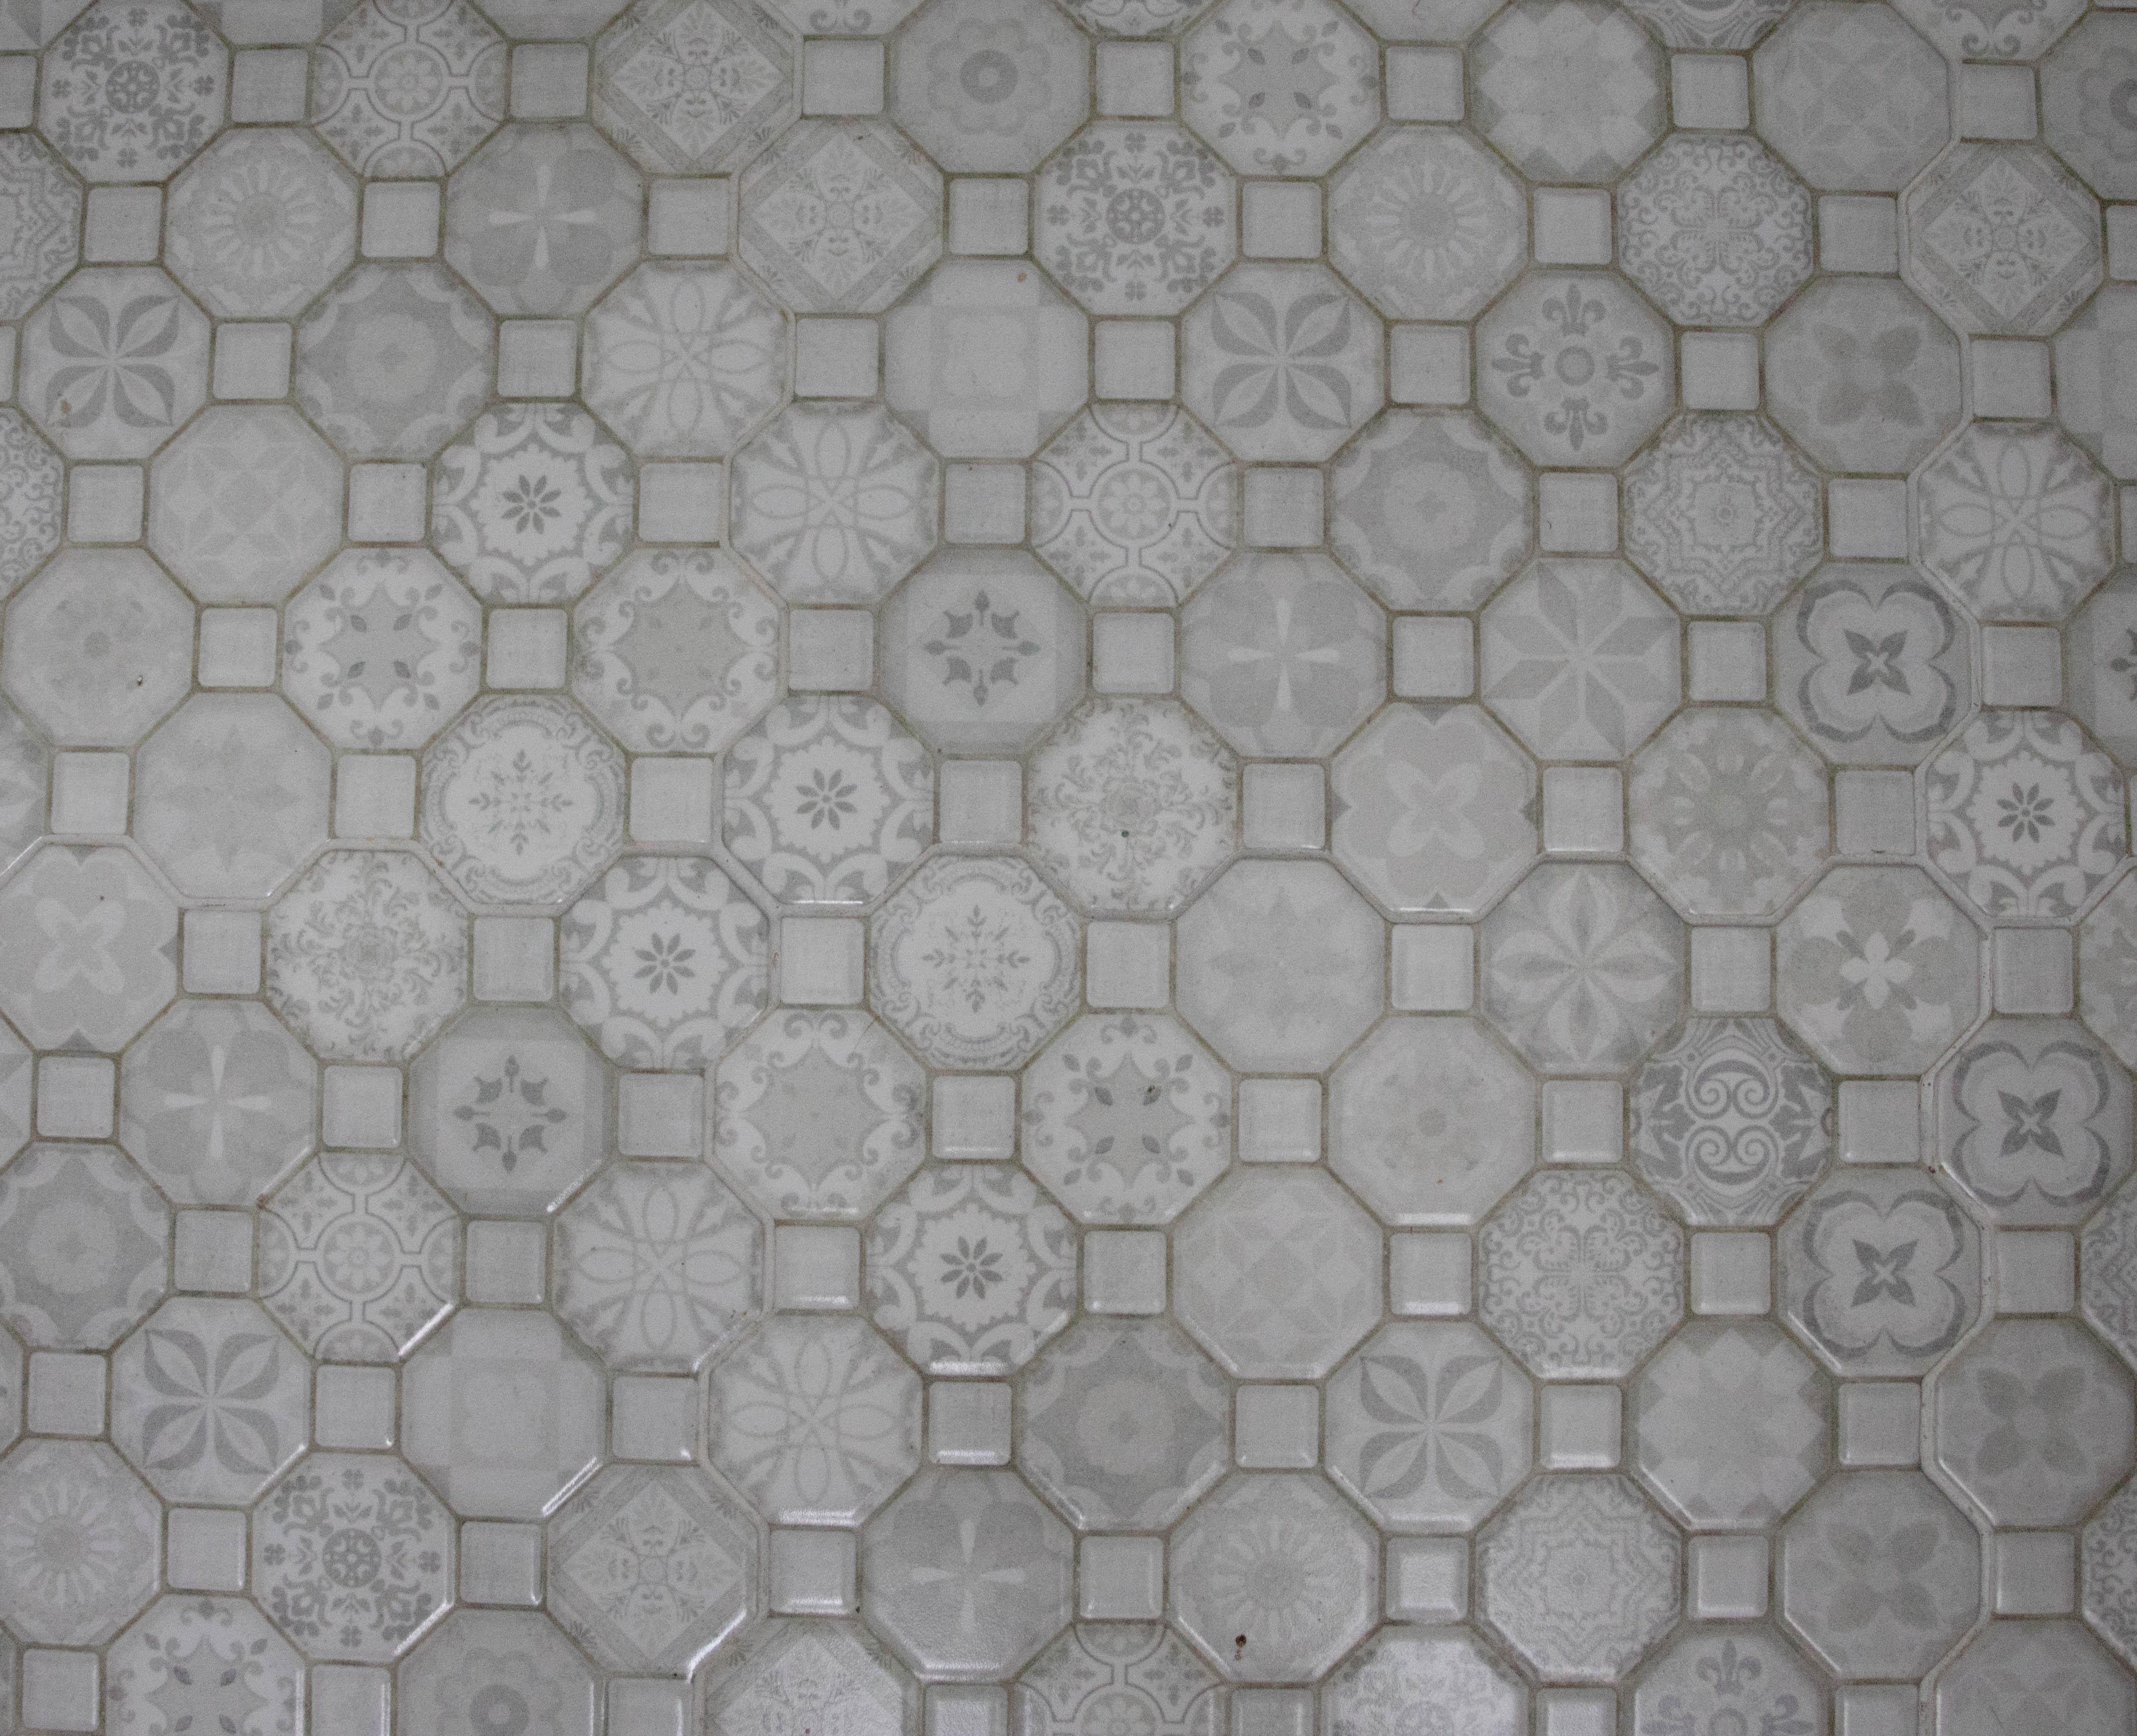 Powder room floor tile